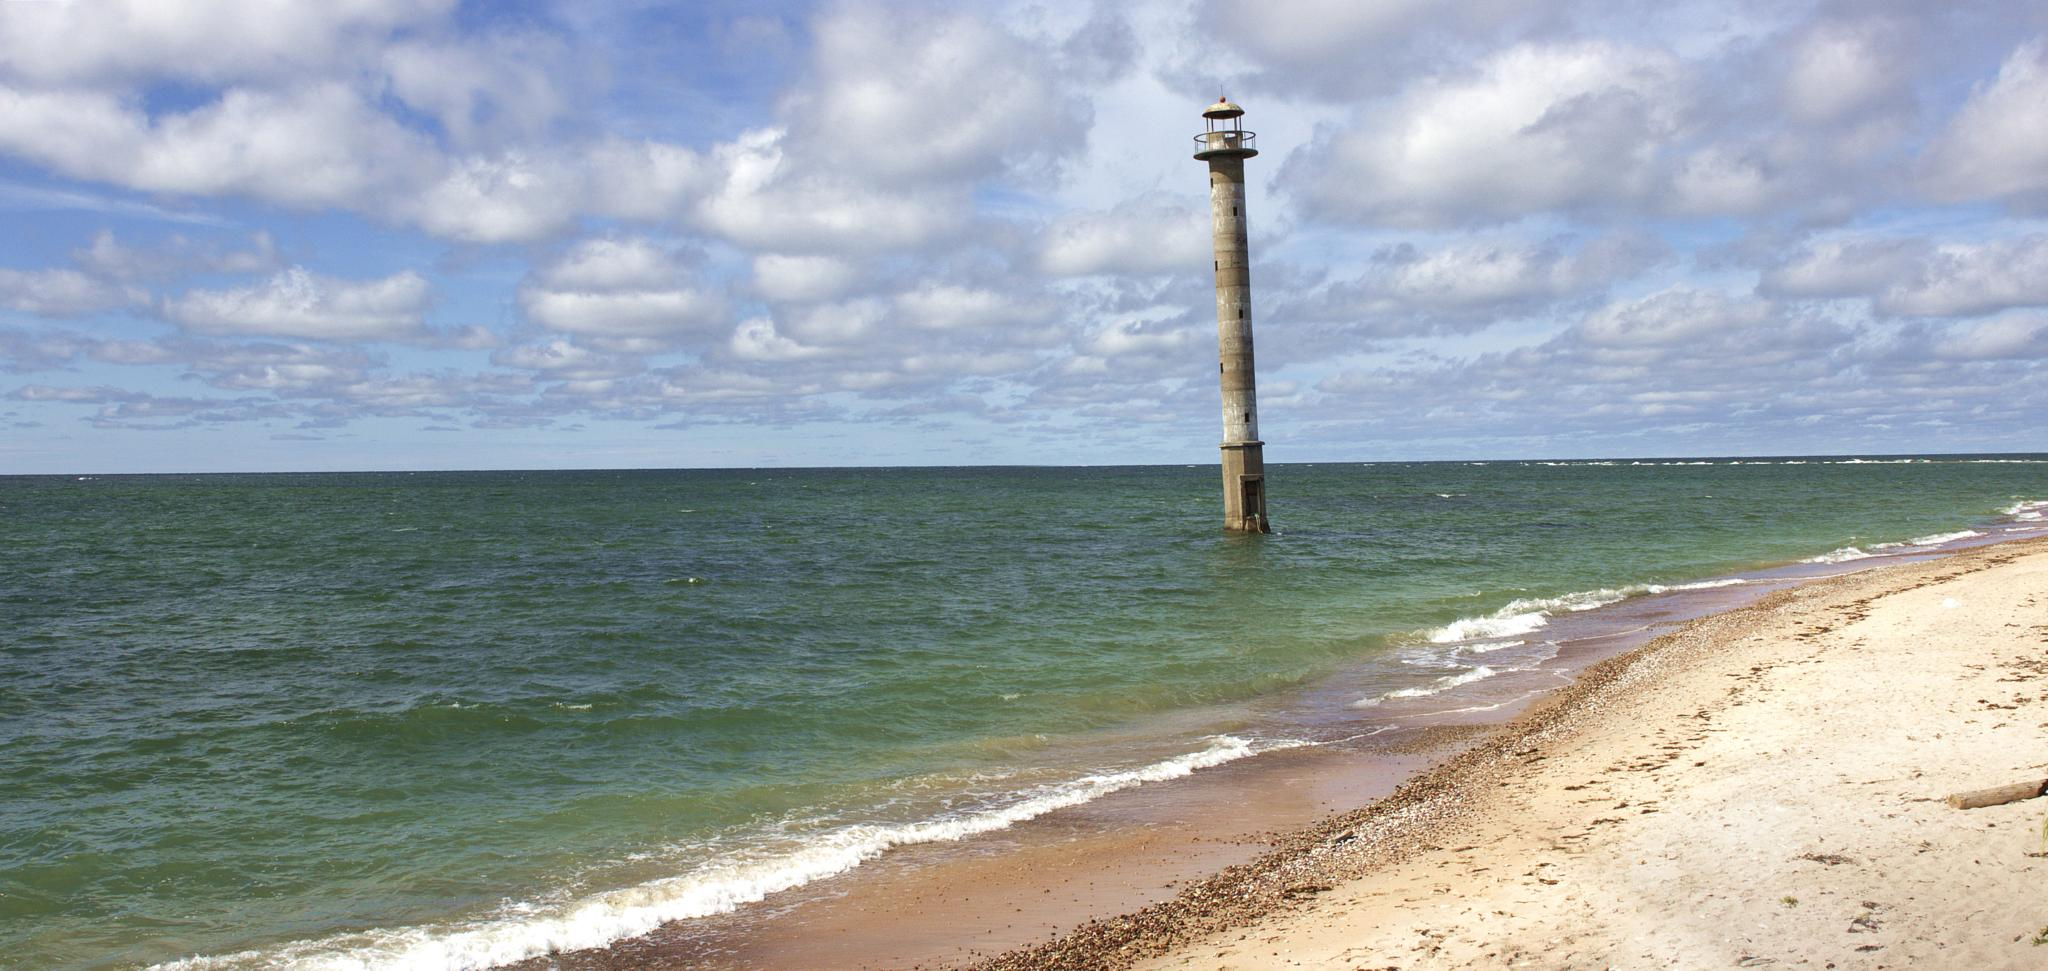 Lighthouse by Mkorho